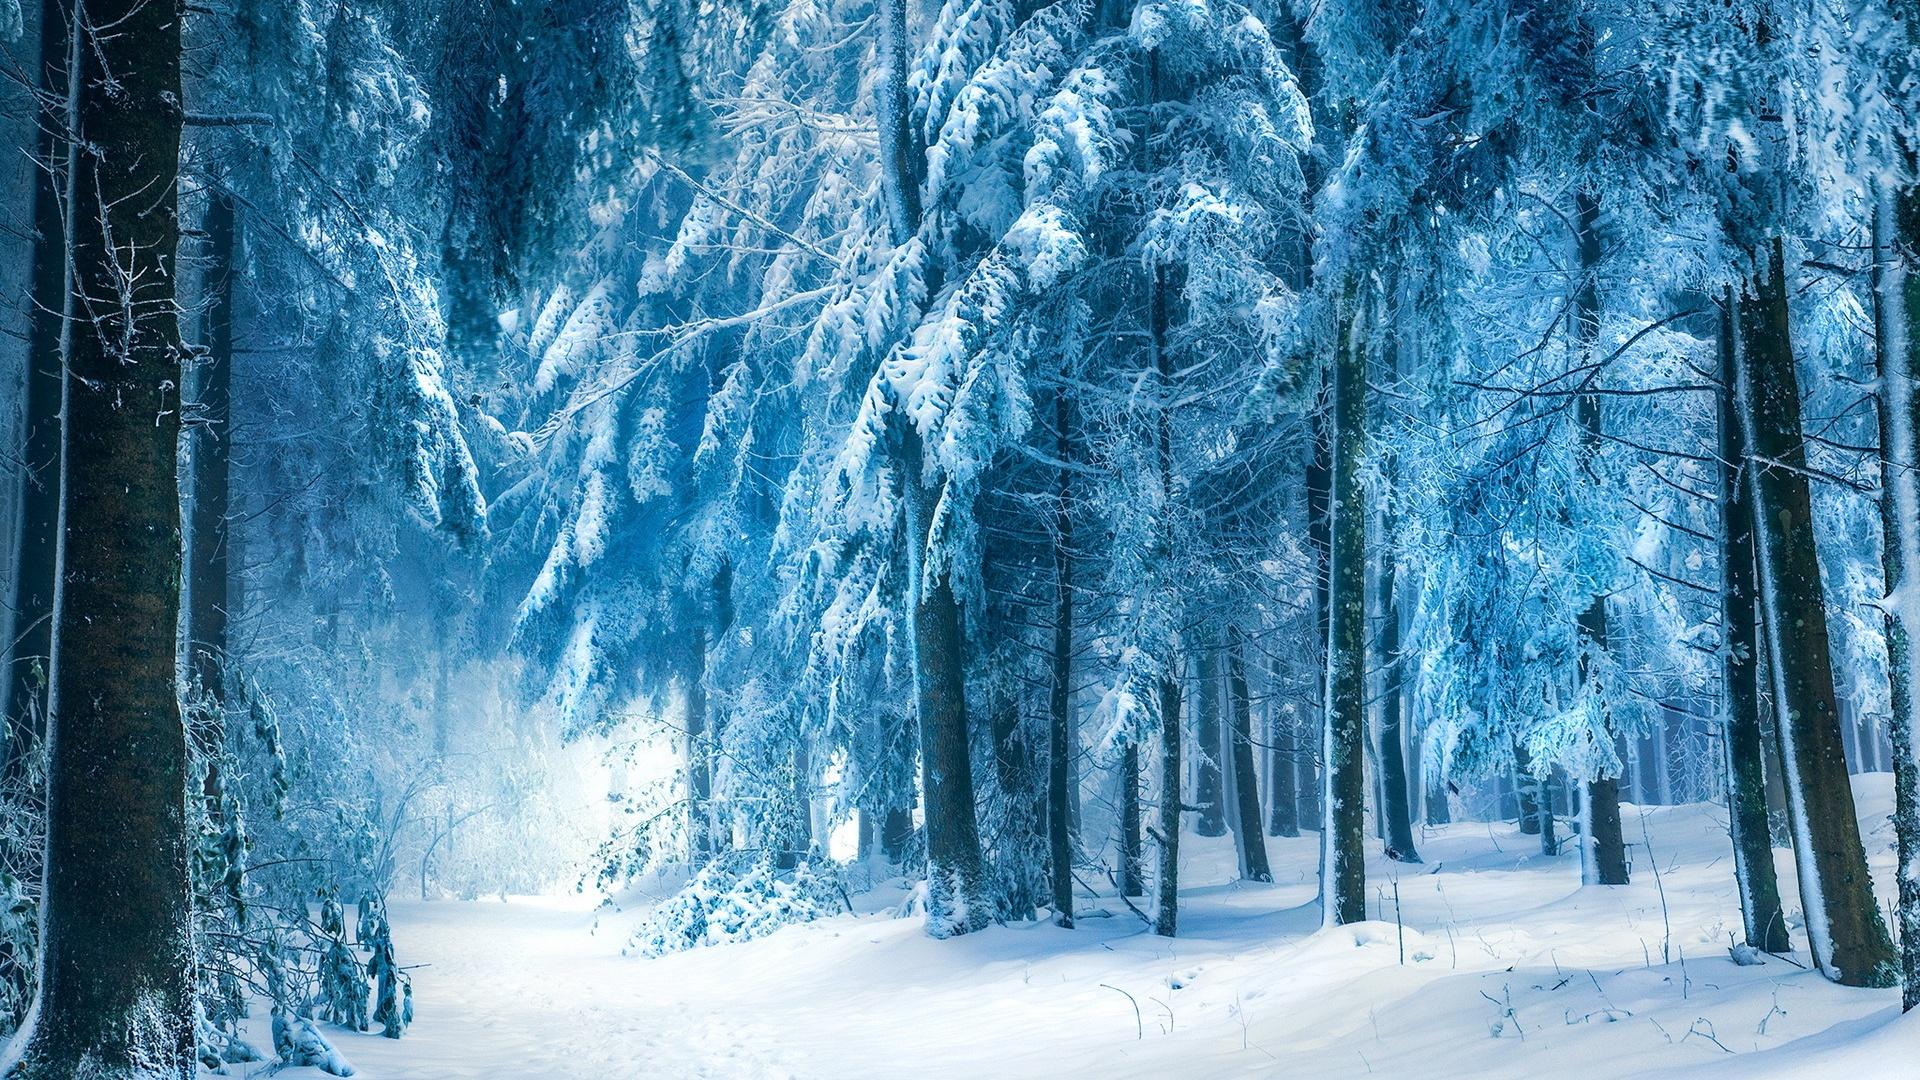 Winter Landscape Snow Forest HD Wallpaper 1920x1080